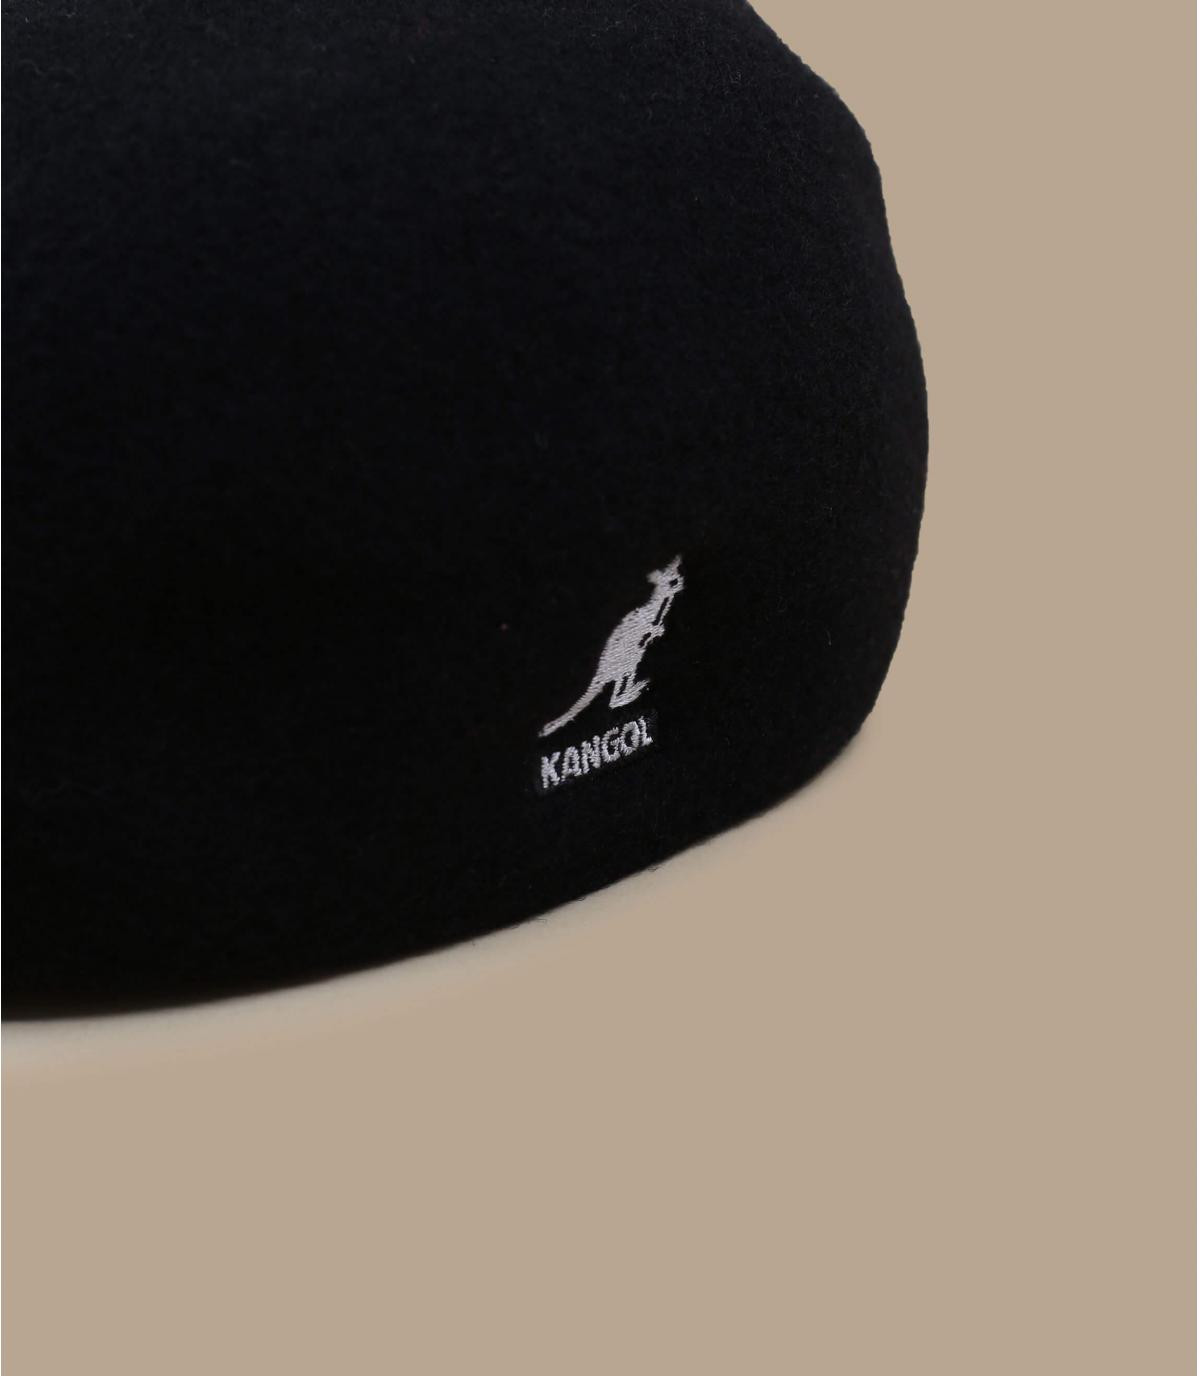 Black 507 ivy cap - 507 wool seamless black by Kangol. 7ec1471b96f